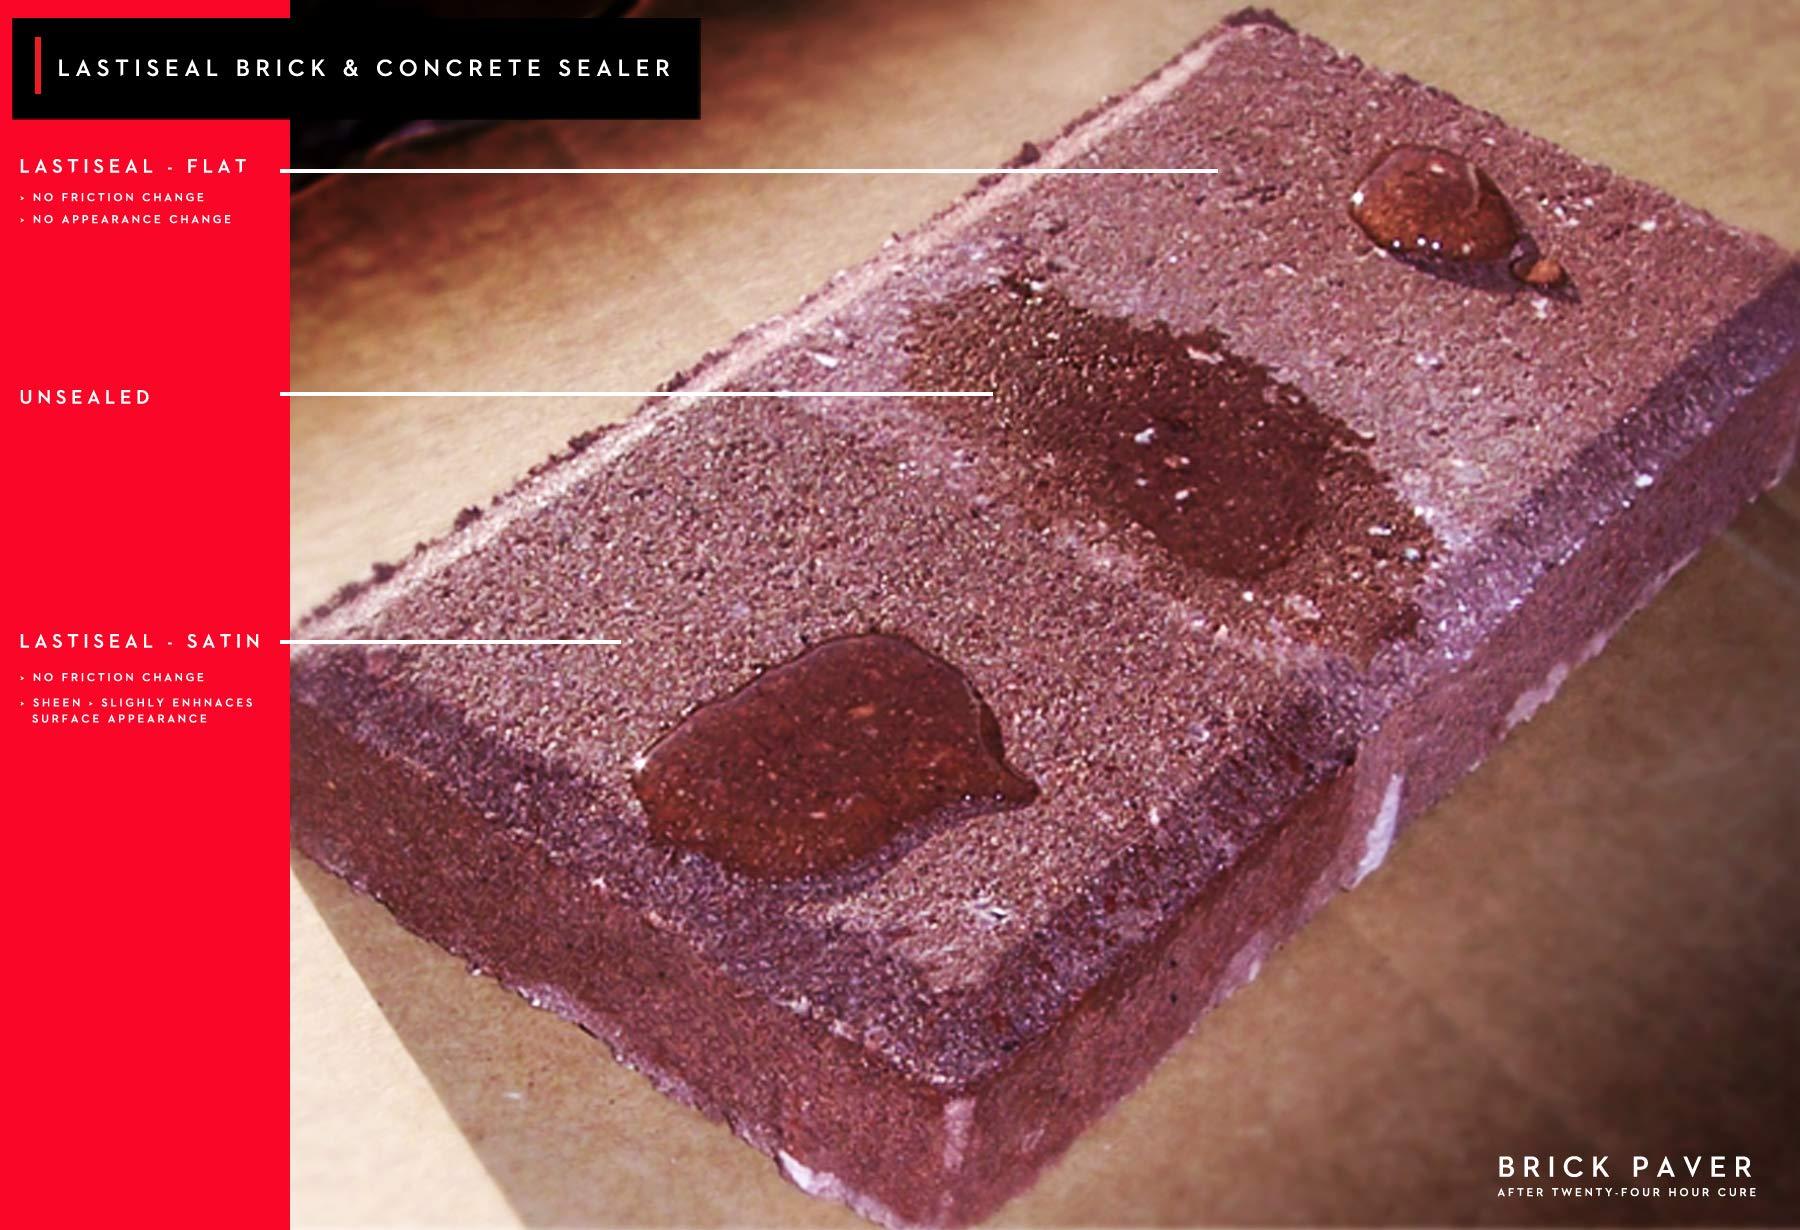 LastiSeal Brick & Concrete Sealer - SATIN Finish (5-gal) | All Purpose Sealer for Brick, Concrete, Stone, Porous Masonry | 15-Year Waterproofing Warranty | Low Gloss Sheen by RadonSeal (Image #4)